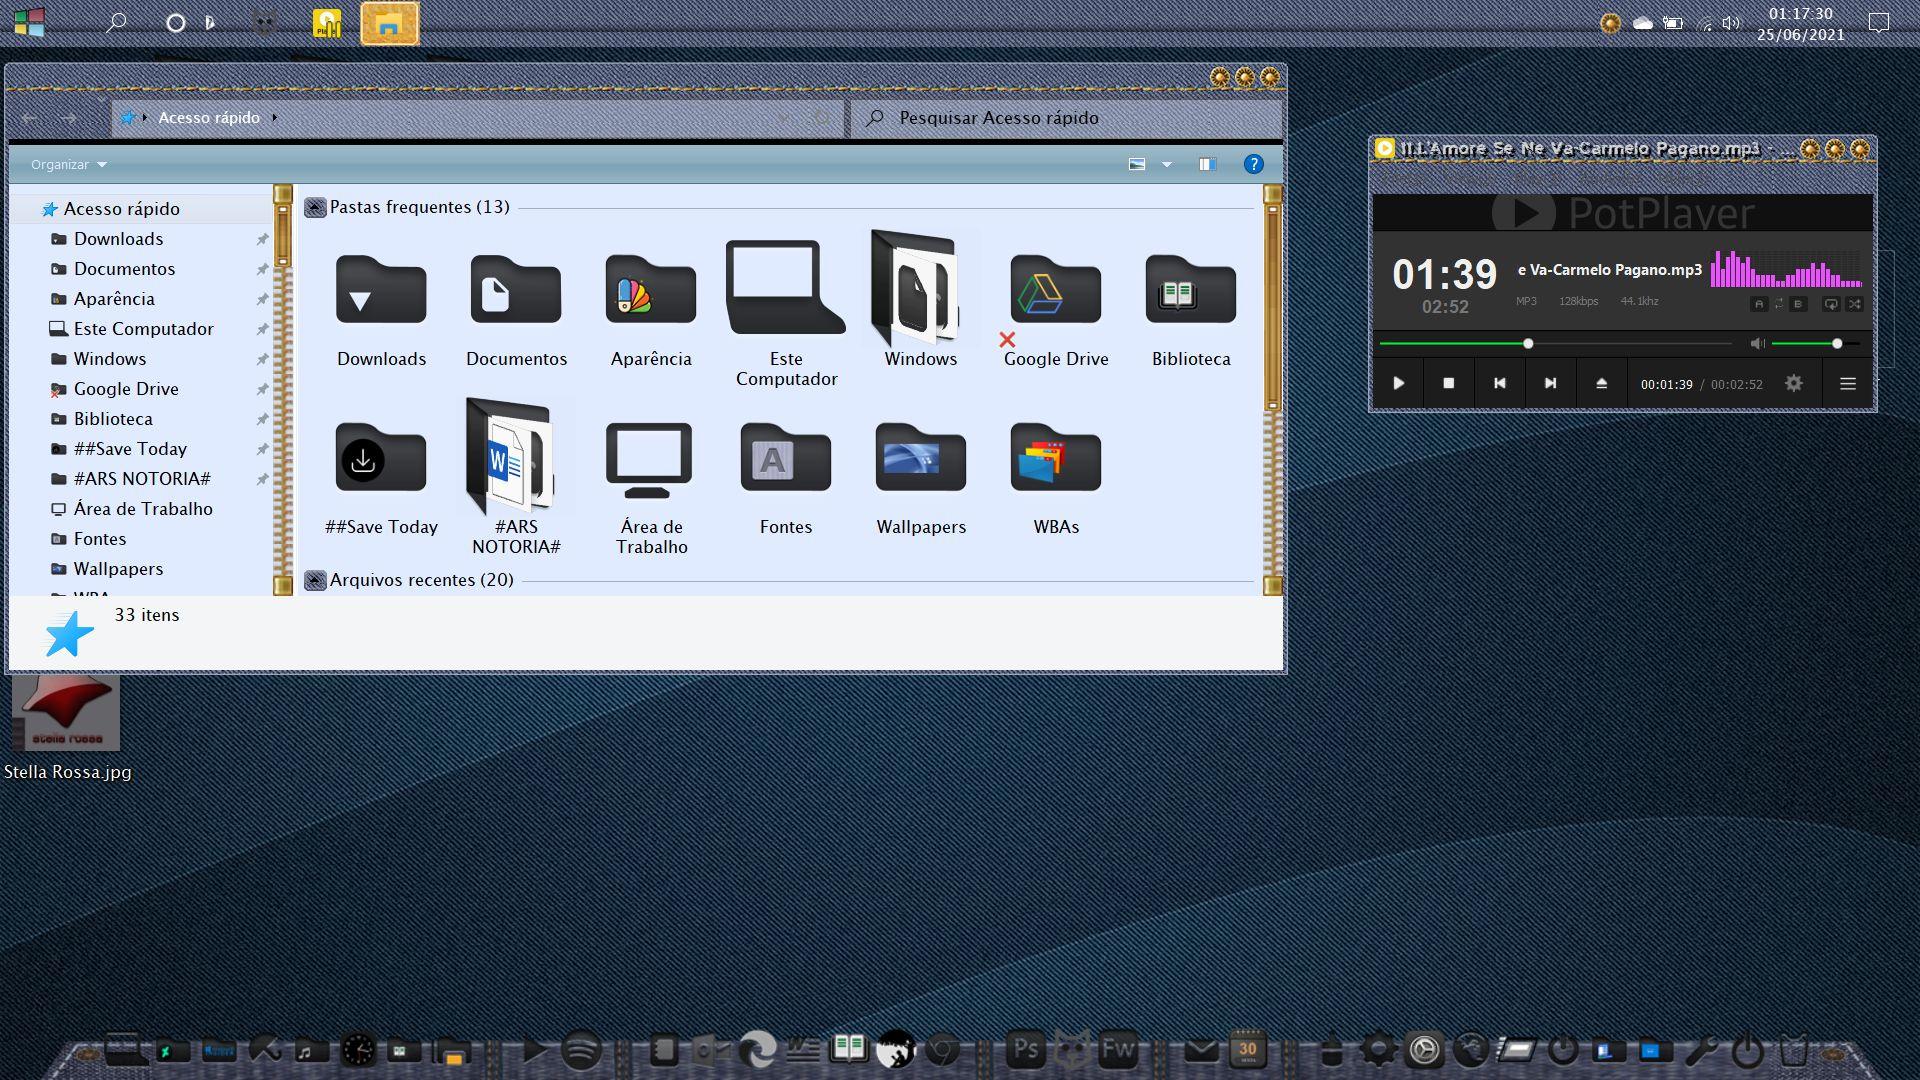 Desktop 06 25 2021